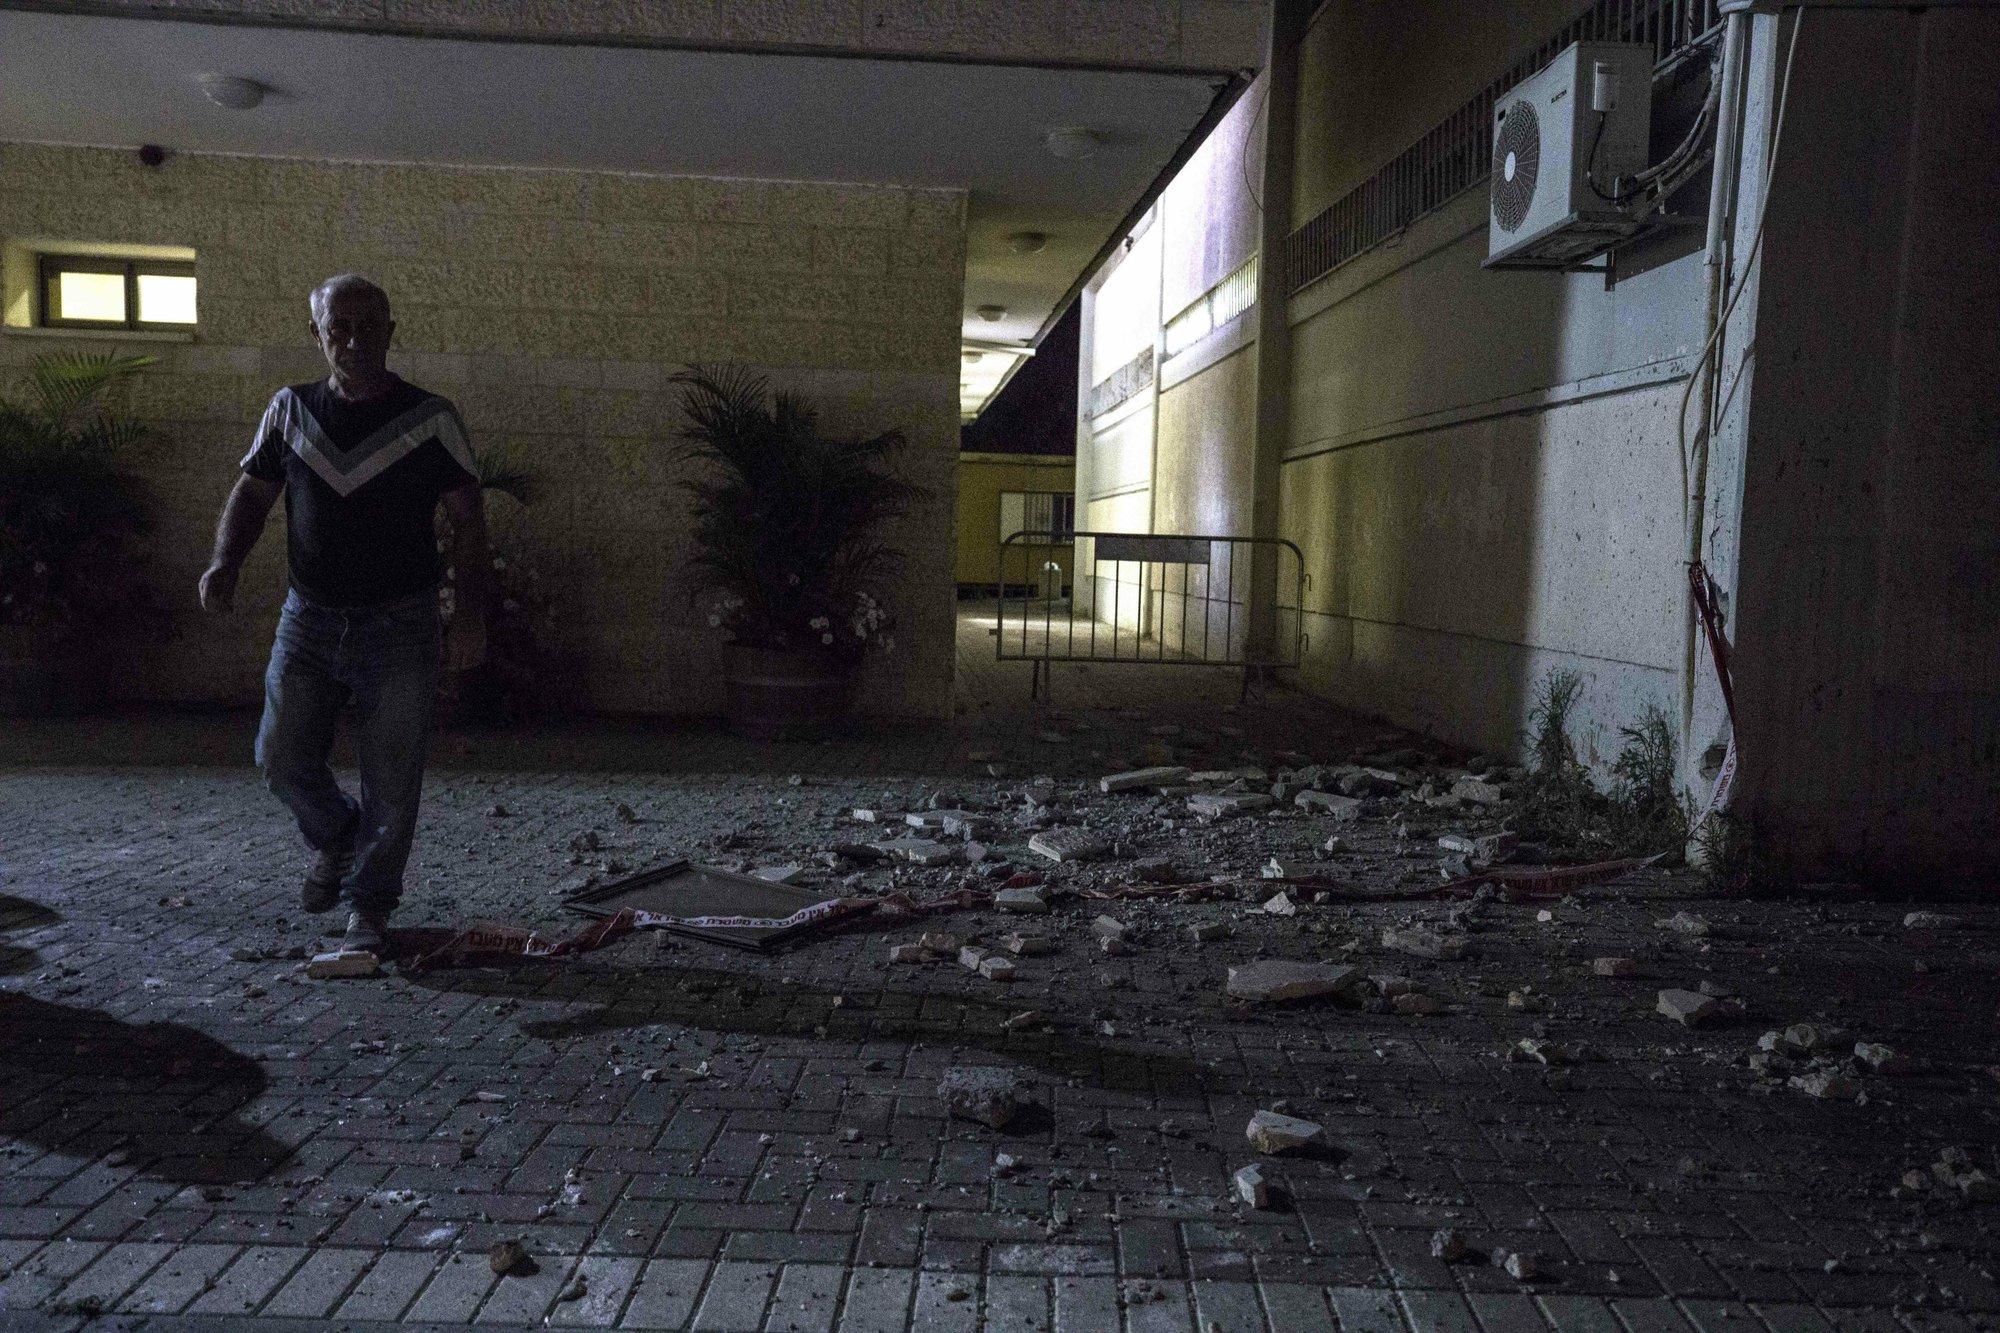 Qatari envoy delivers aid to Gaza in cease-fire effort